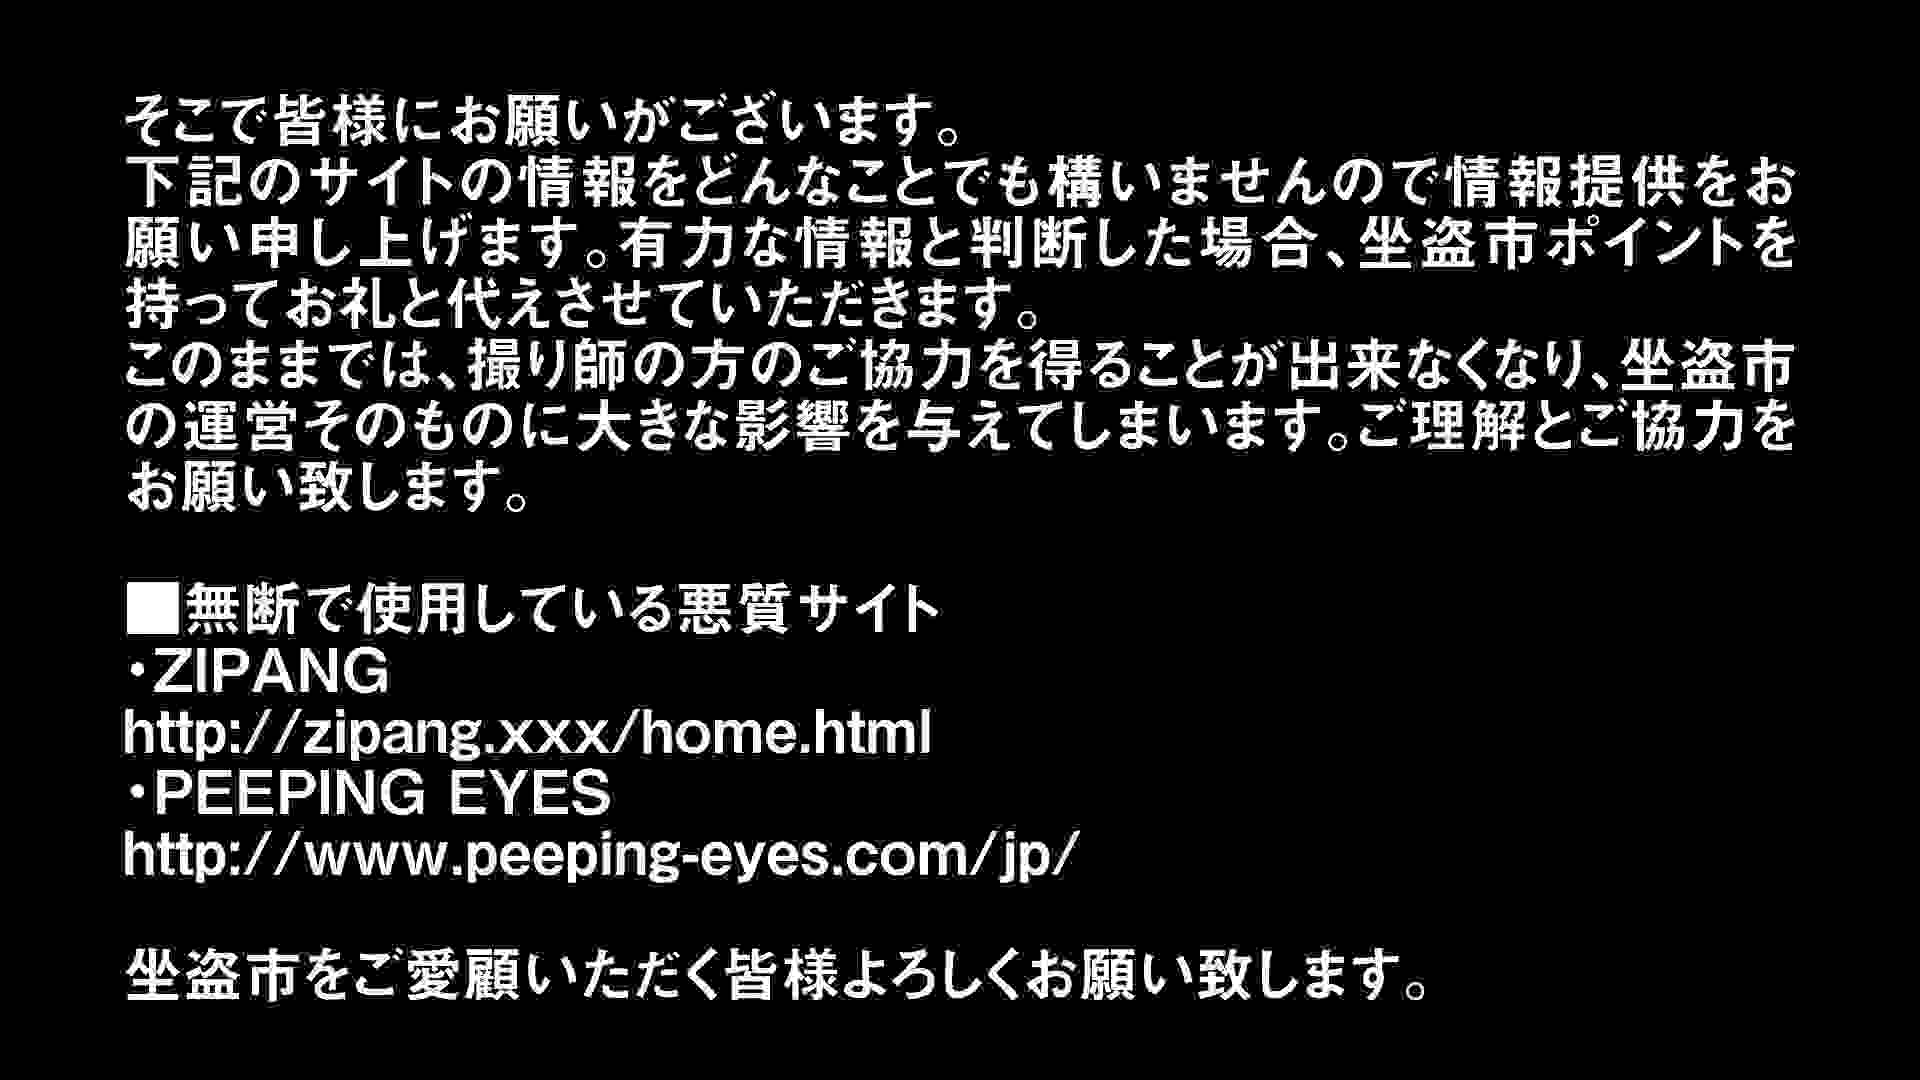 Aquaな露天風呂Vol.303 盗撮シリーズ   露天風呂編  90PIX 1